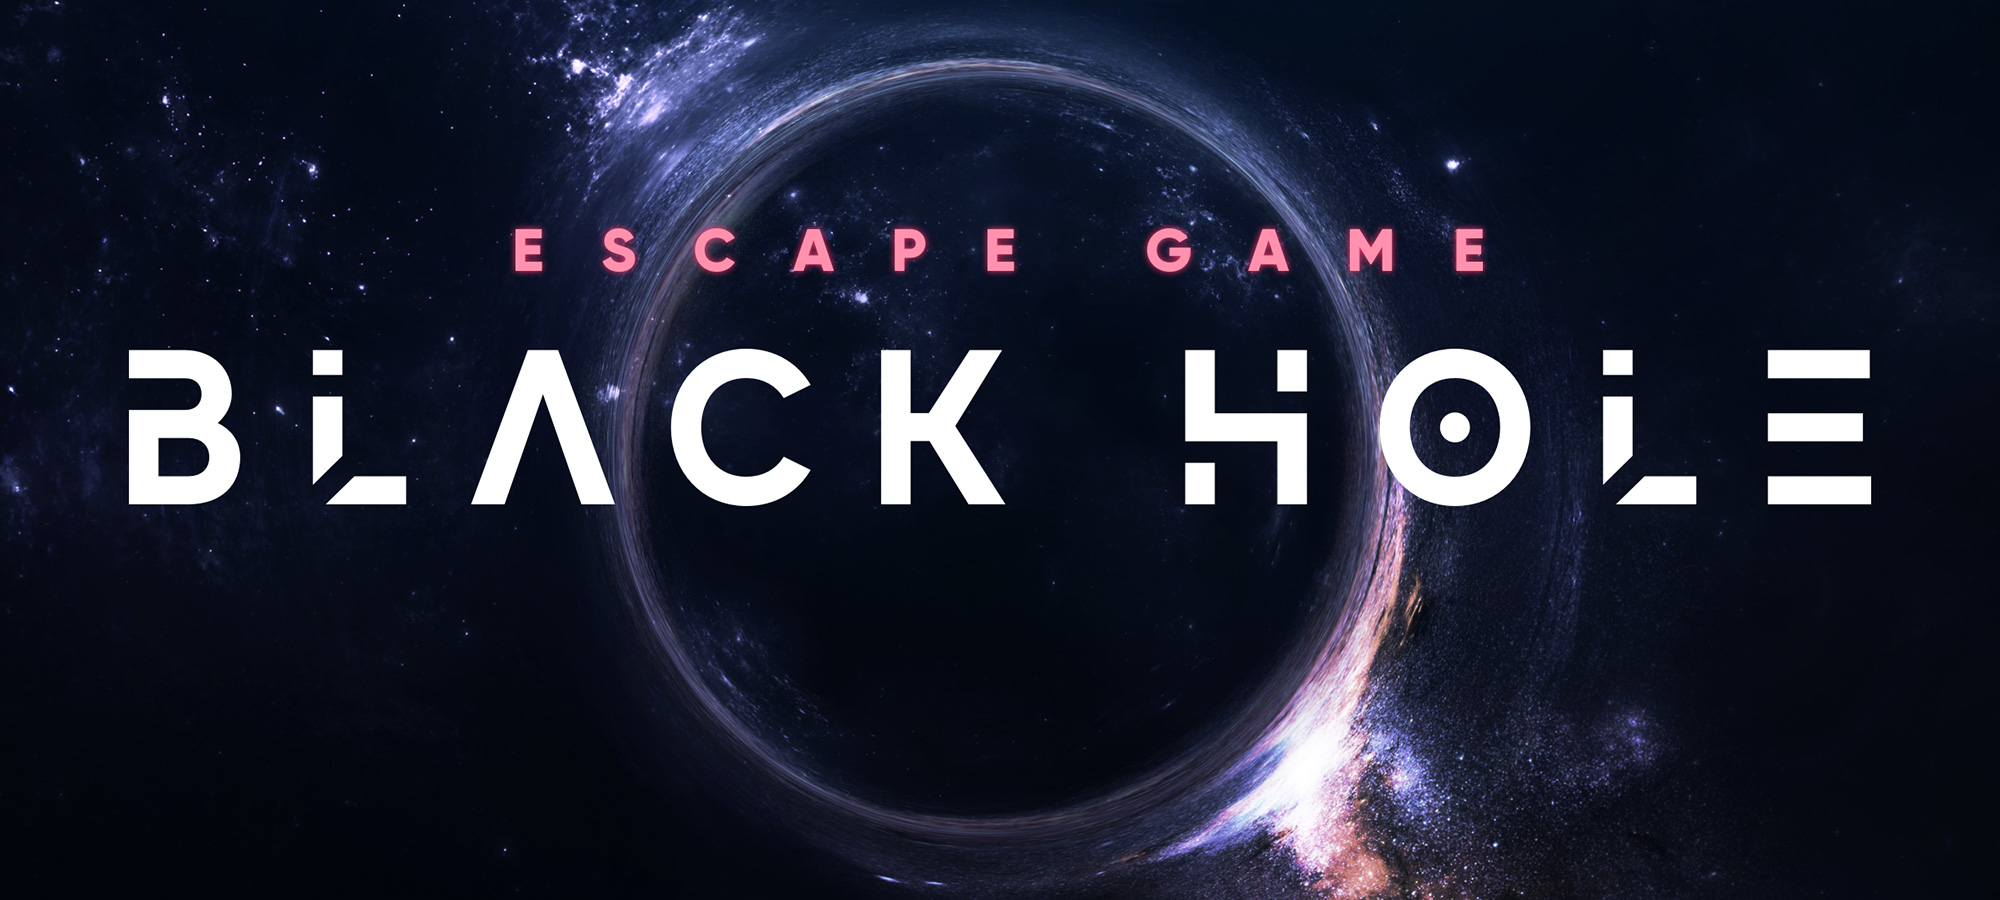 Escape Game Bl@ck H0l3